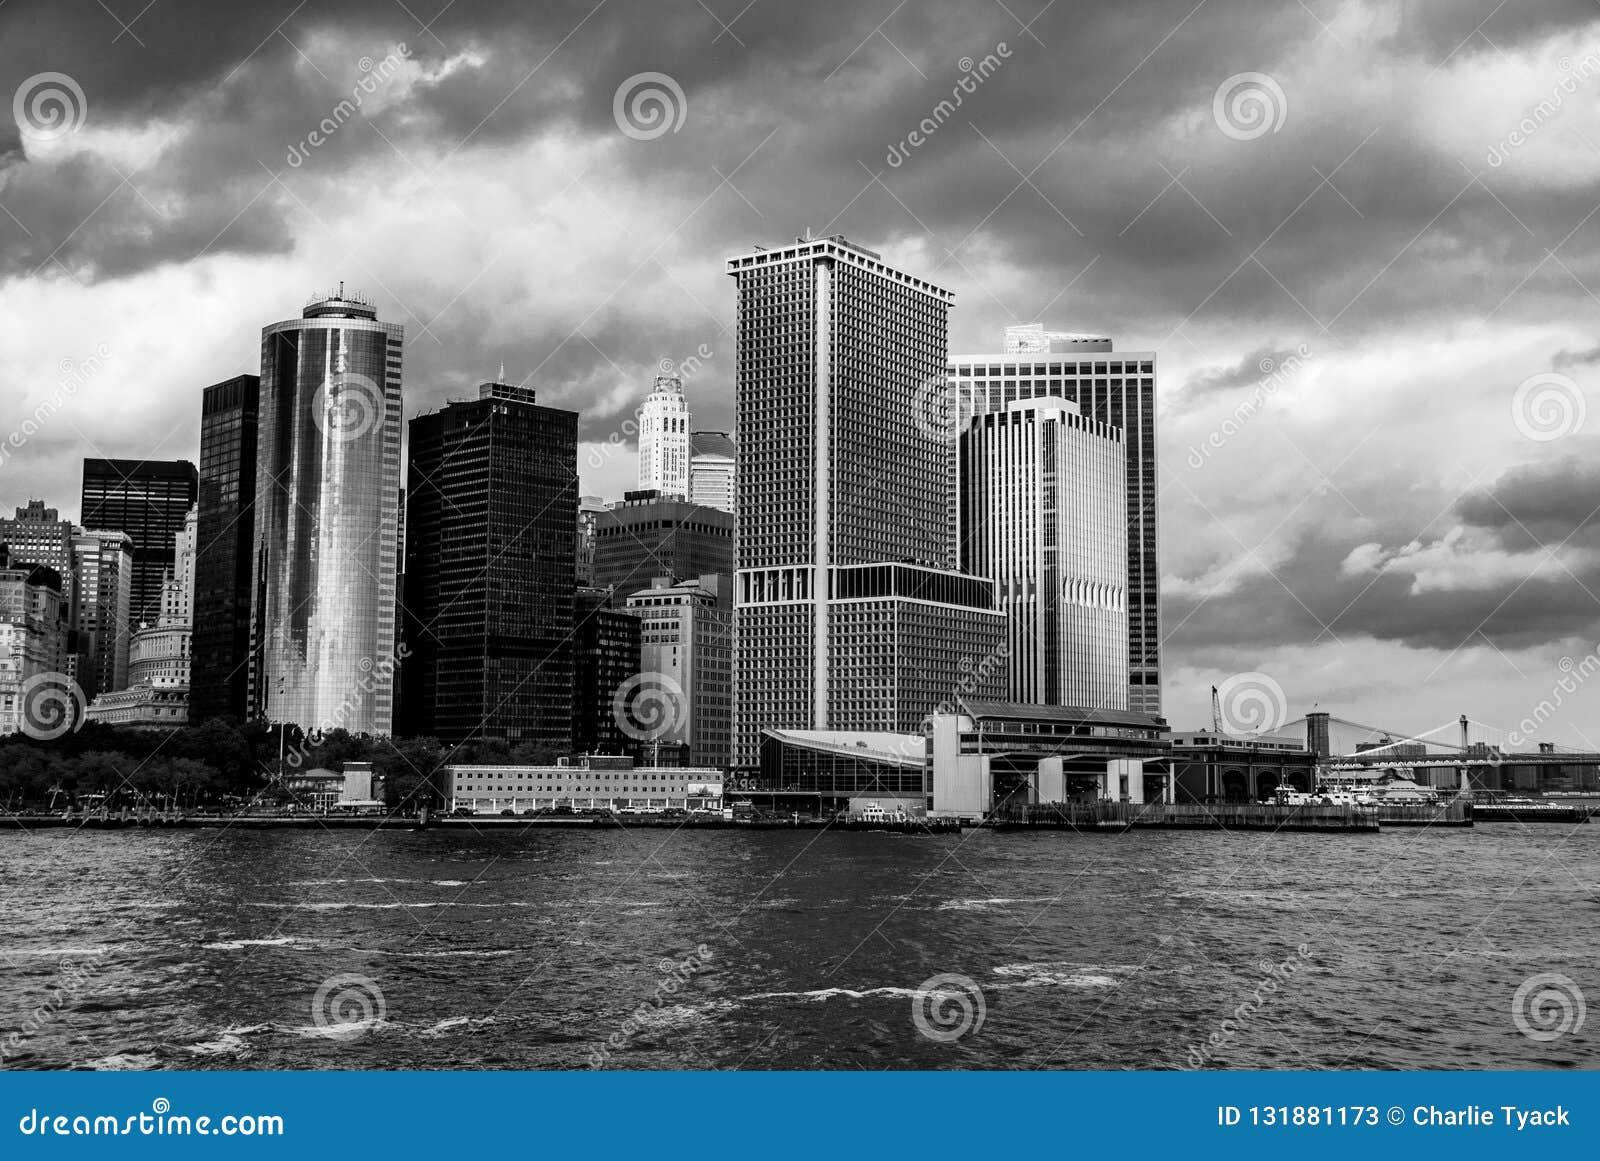 Manhattan comme vu de Staten Island Ferry - astuce du sud-est - noir et blanc